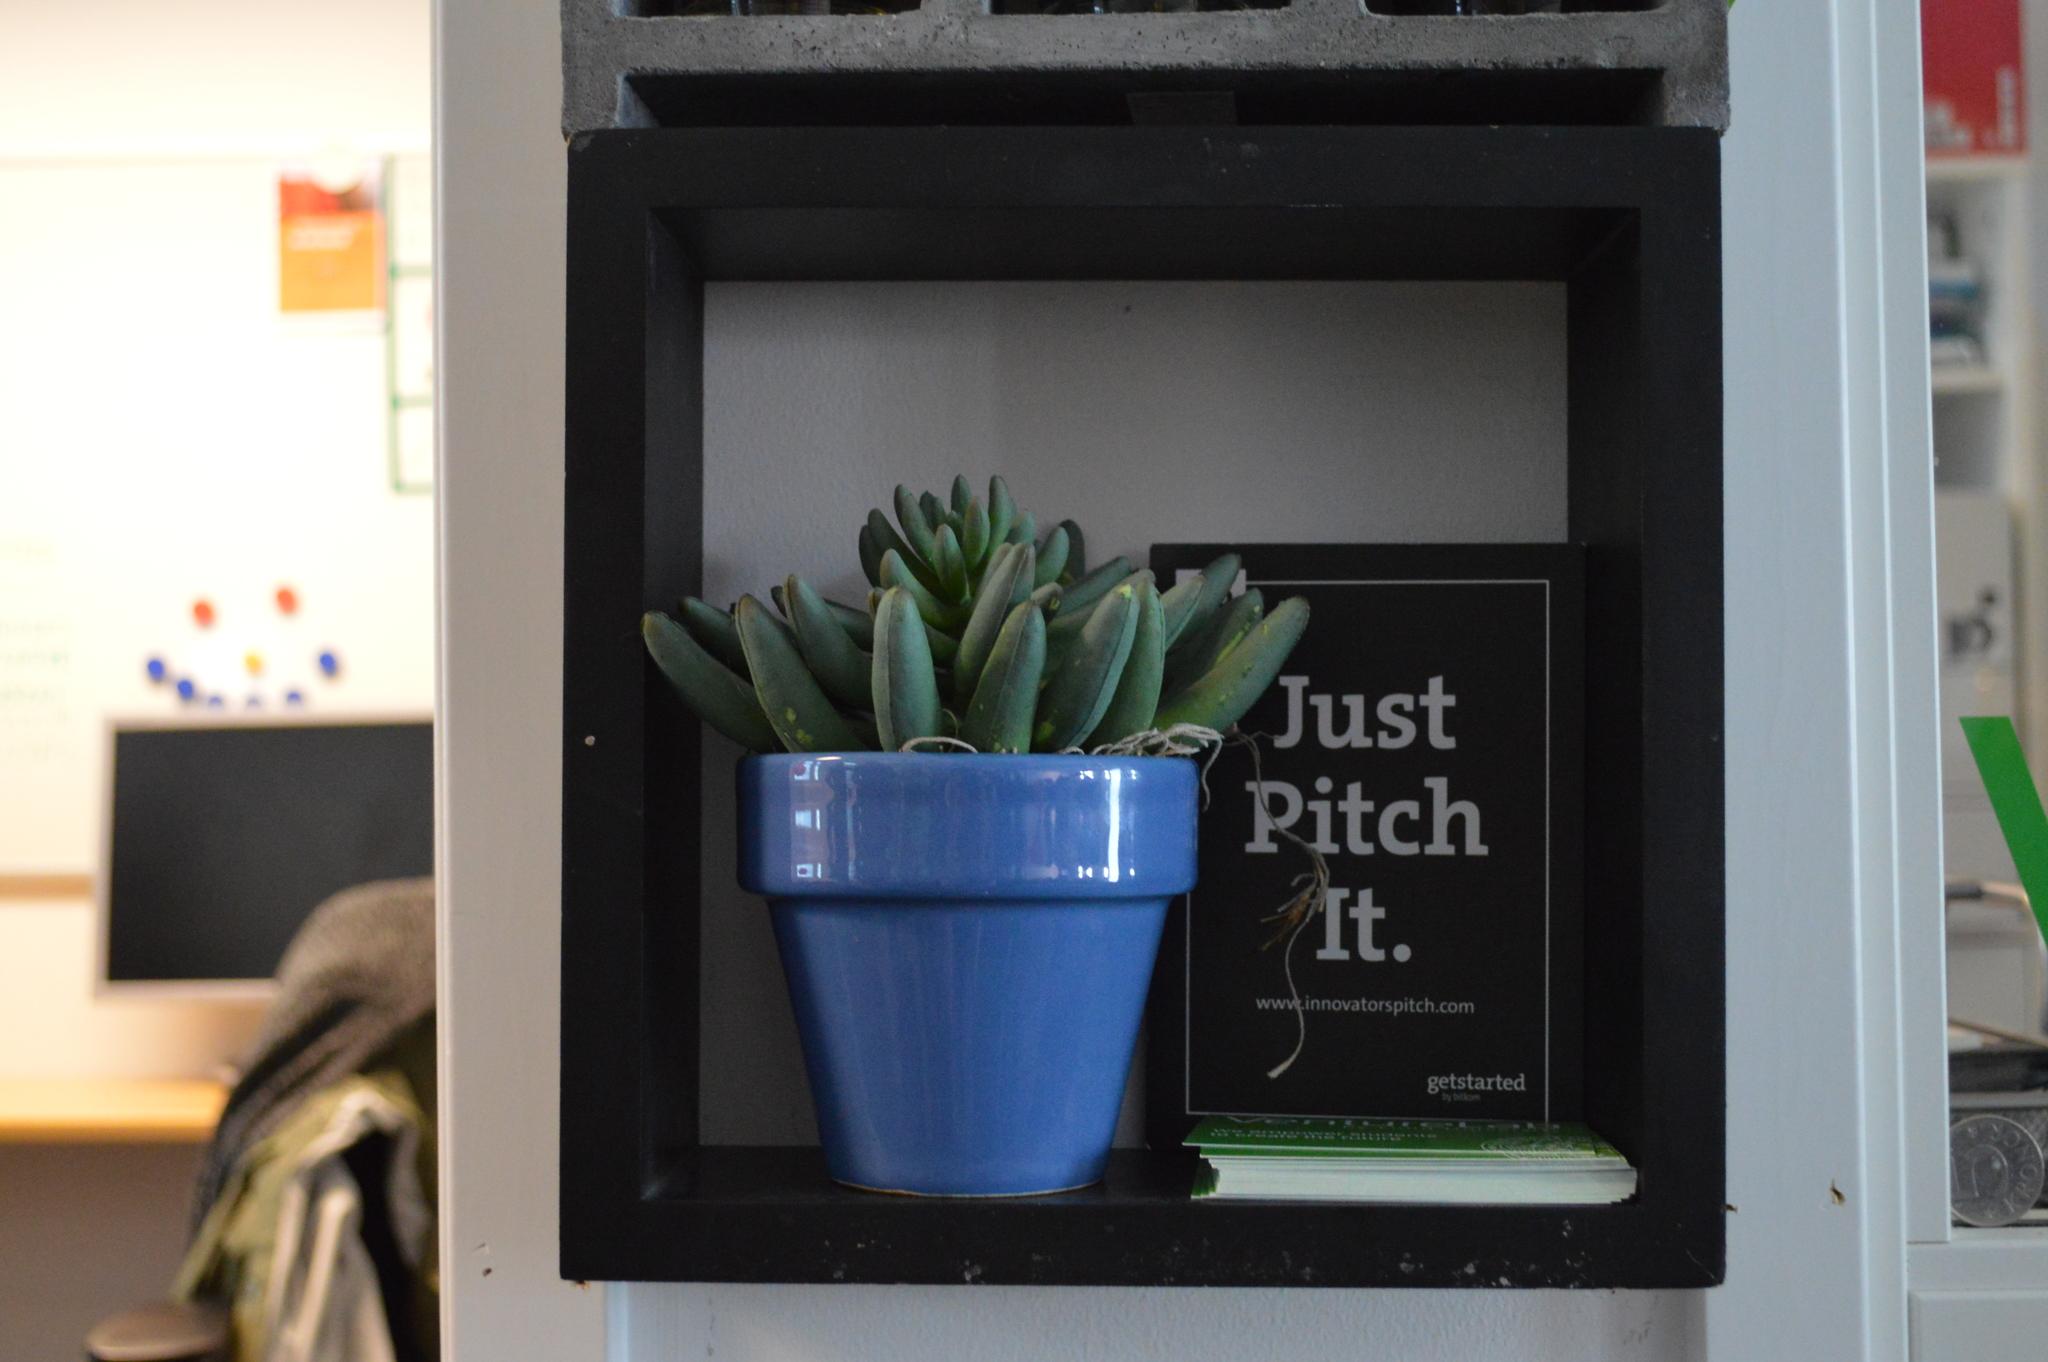 Inkubator pitch it.jpg